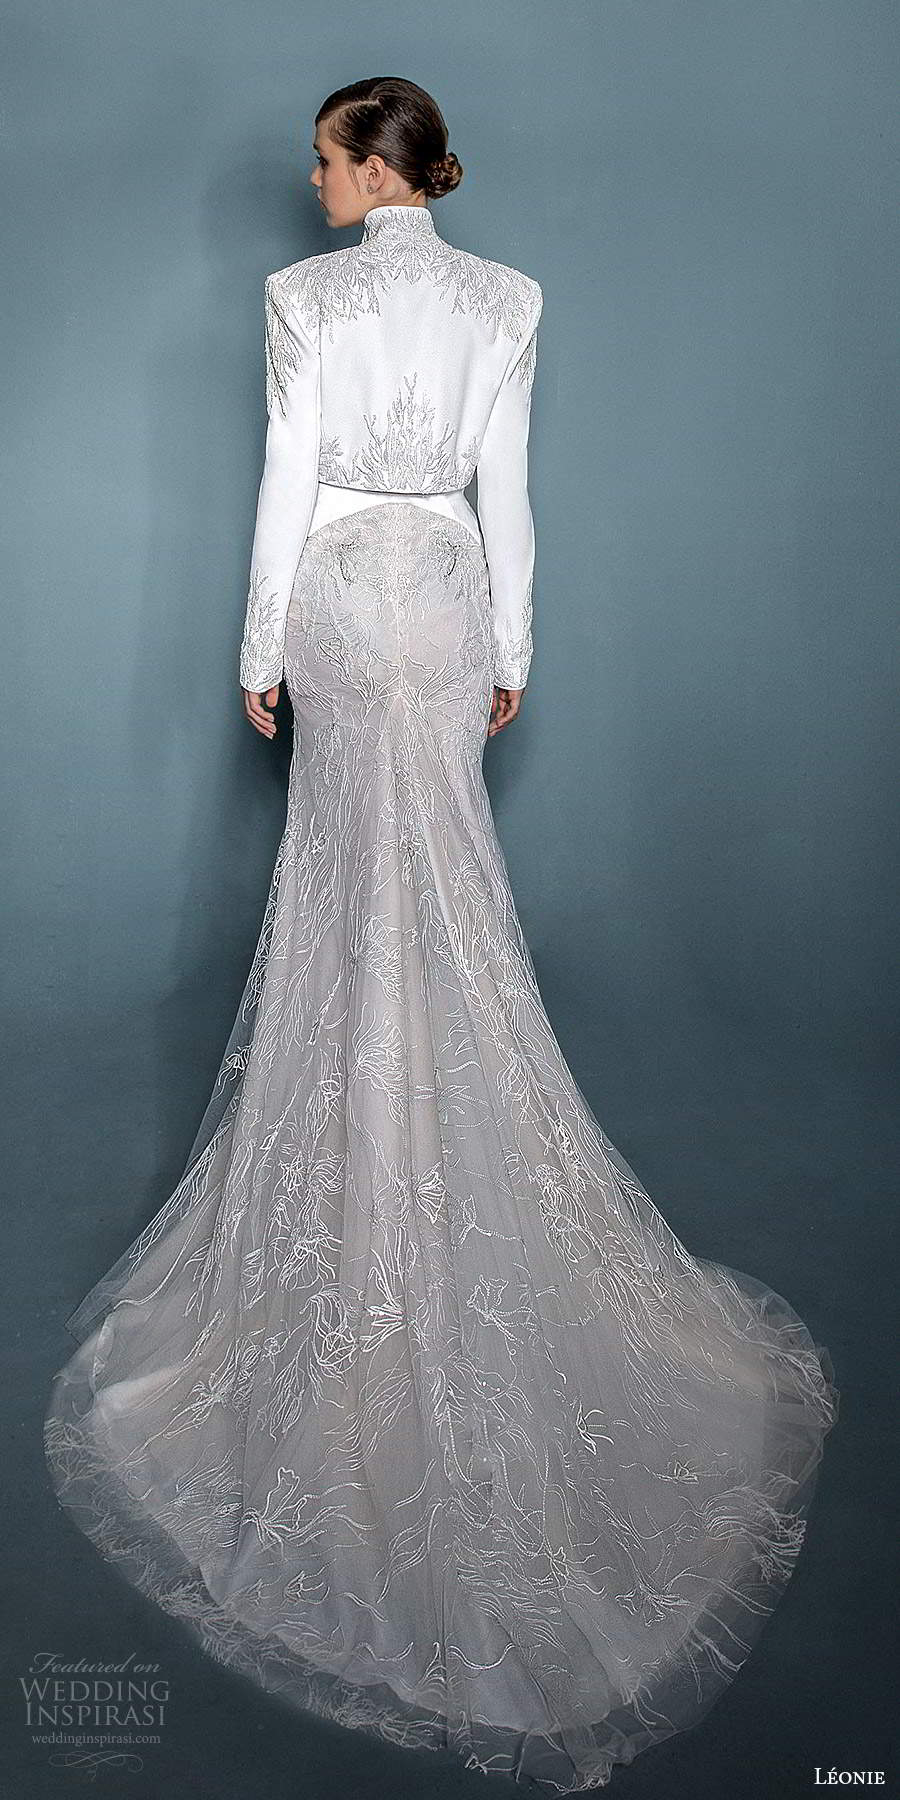 leonie bridal 2020 bridal sleeveless thin straps plunging v neckline embellished fit flare mermaid wedding dress slit skirt chapel train jacket (1) bv